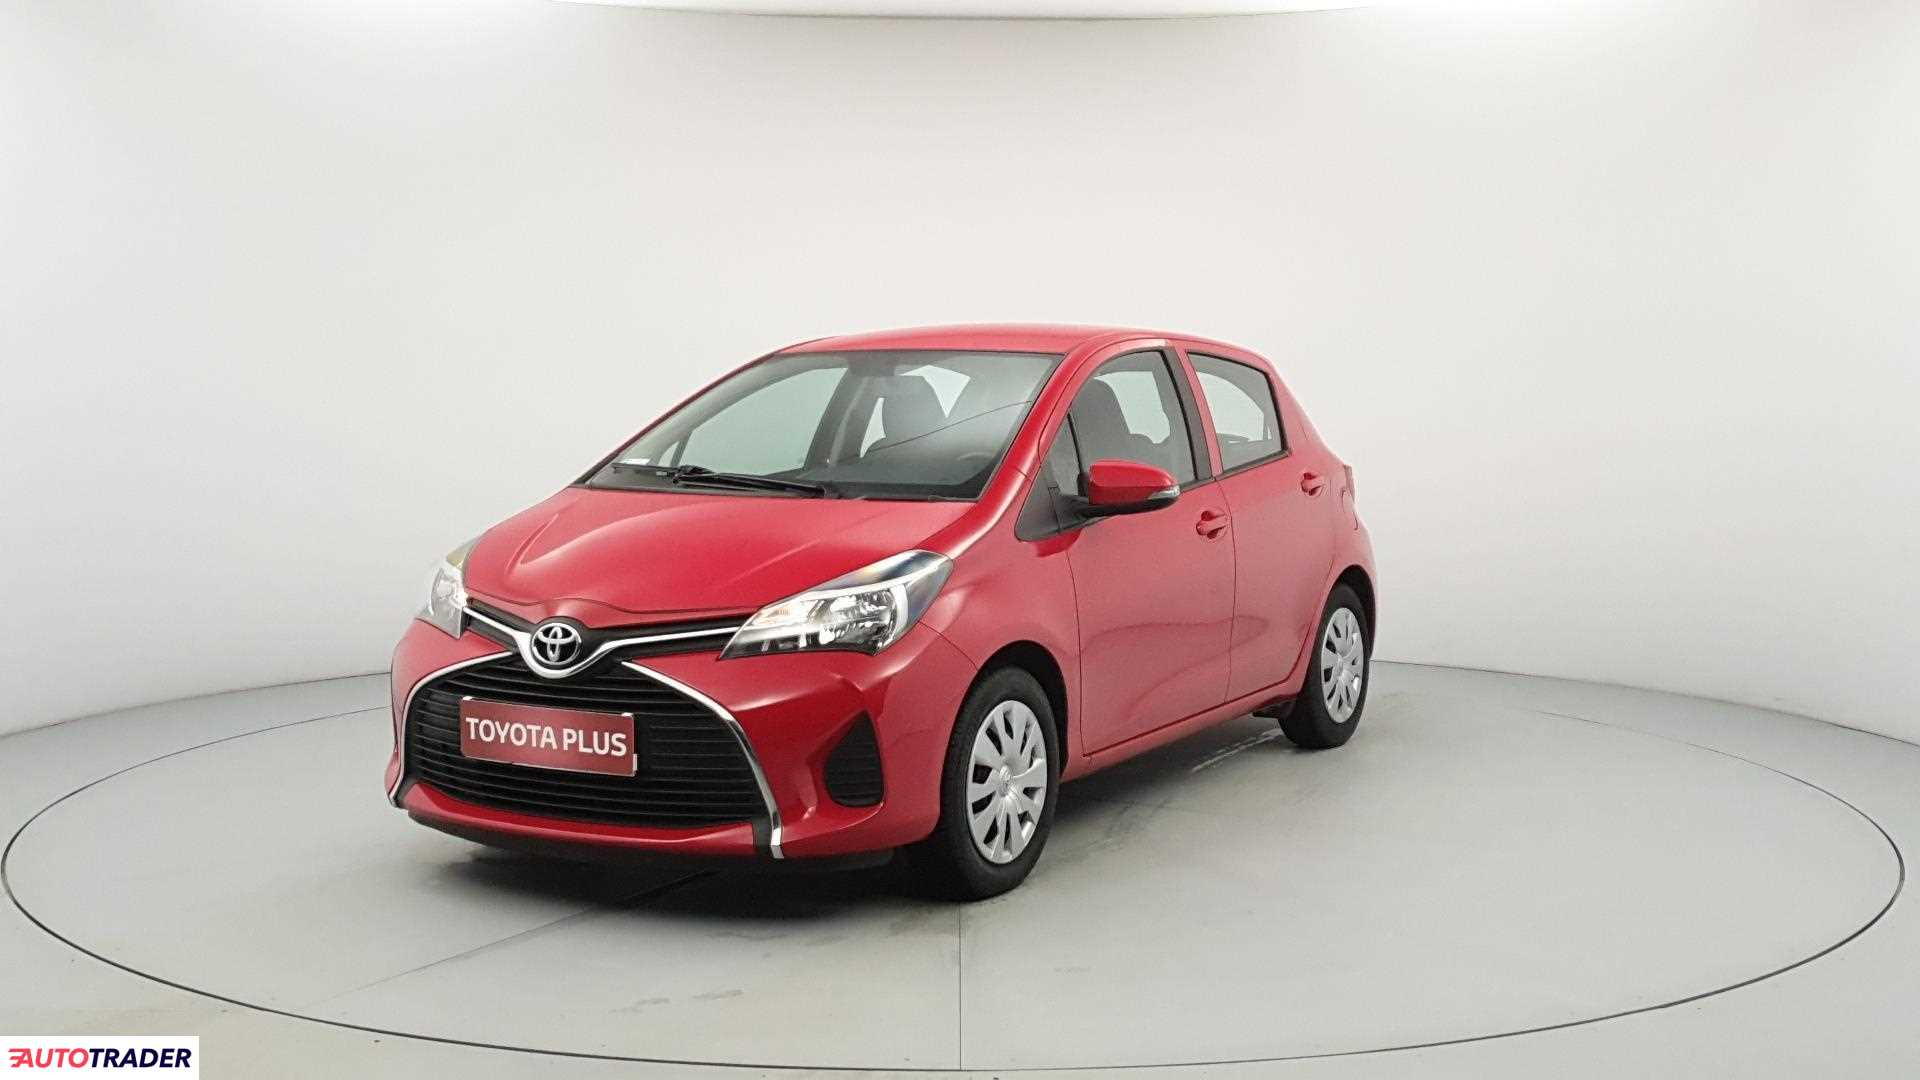 Toyota Yaris 2015 1.0 69 KM